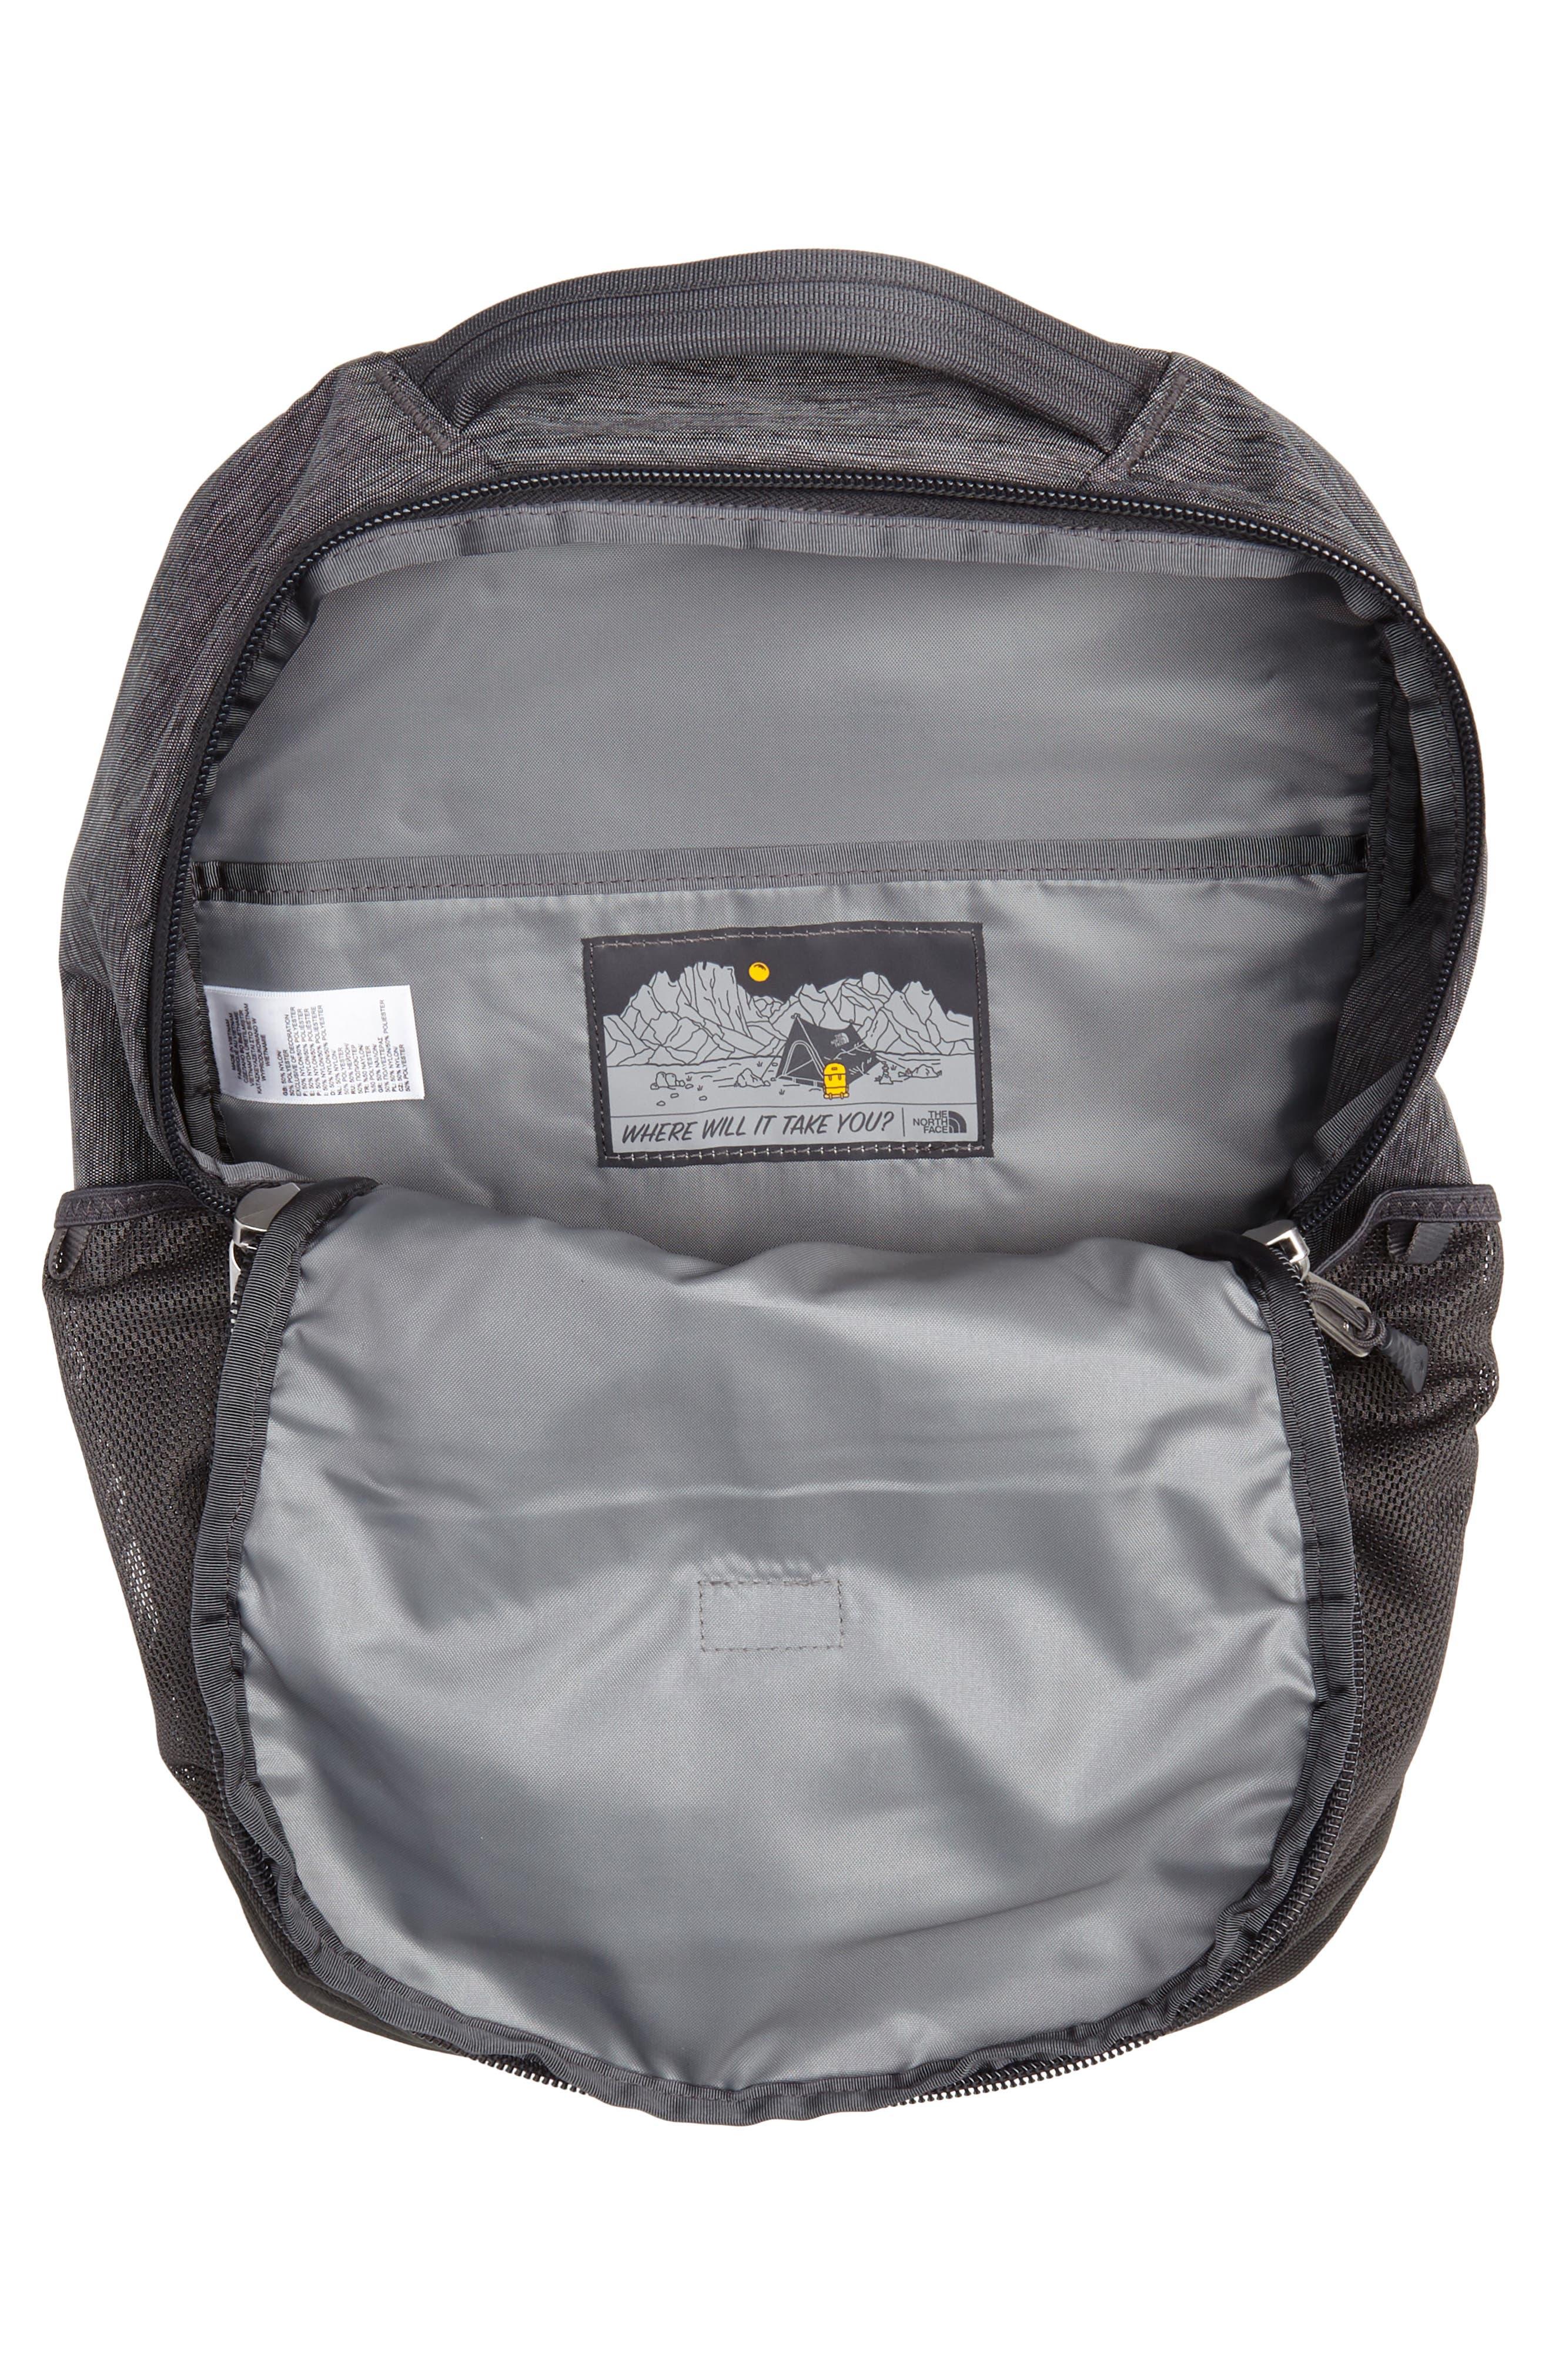 Vault Backpack,                             Alternate thumbnail 3, color,                             ASPHALT GREY/ DRAMATIC PLUM